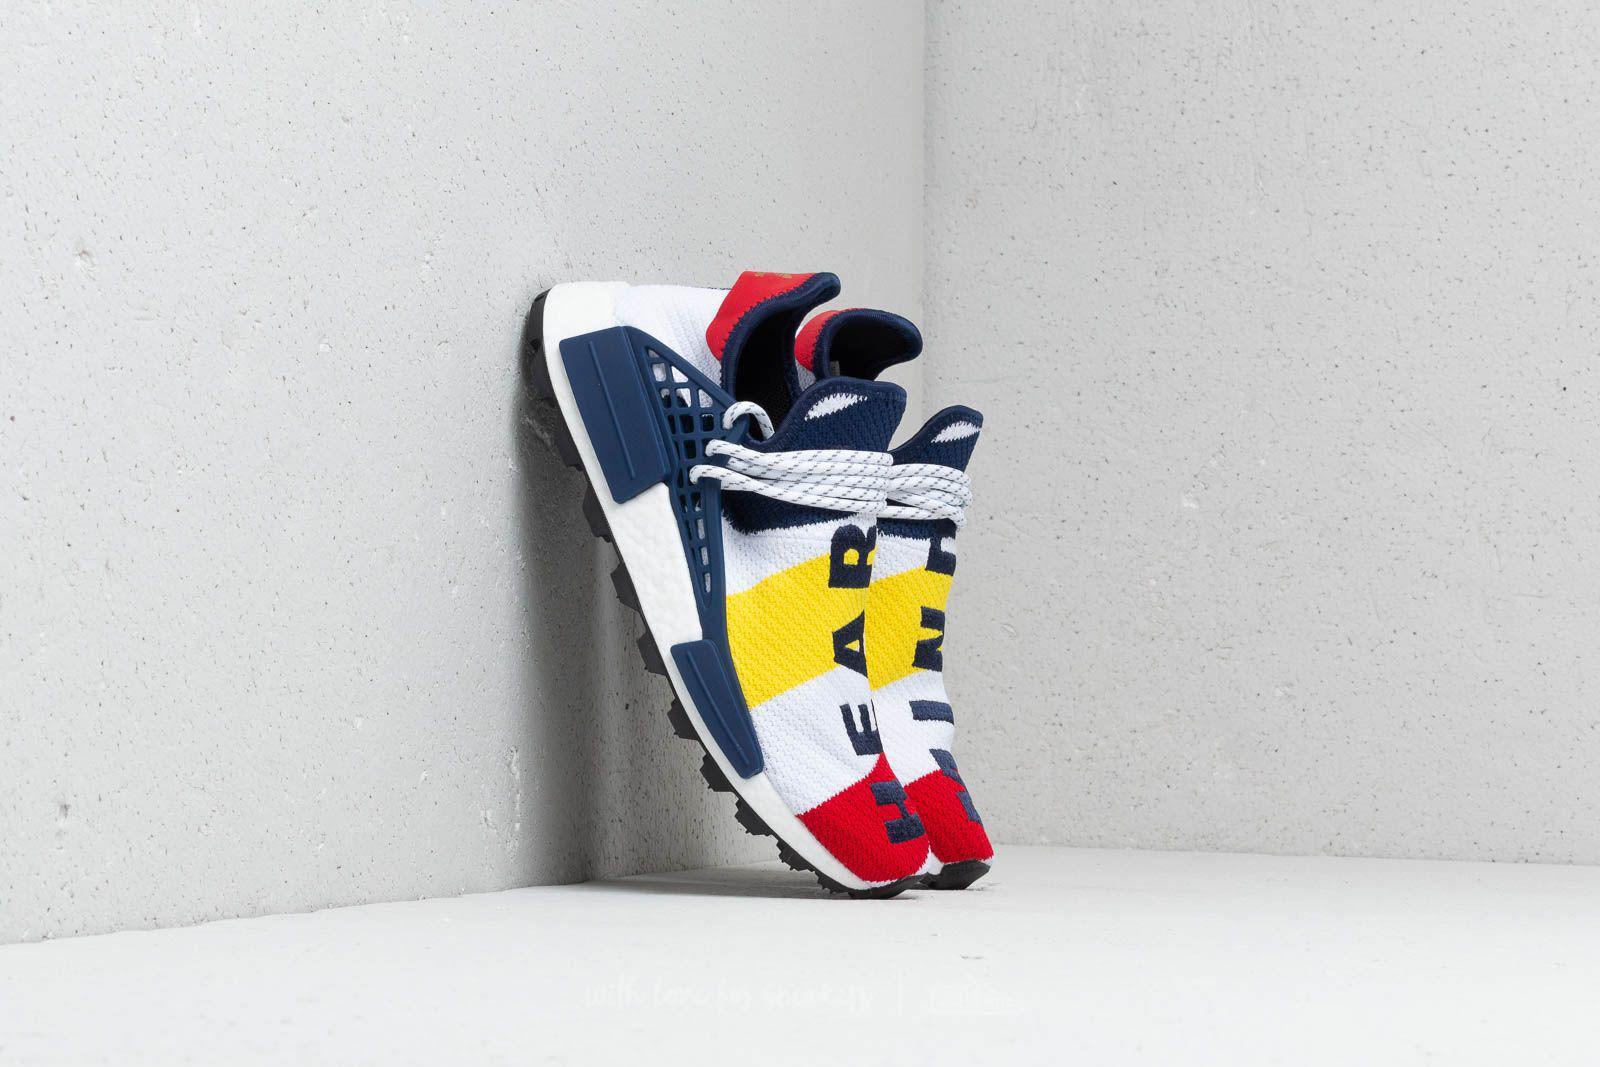 a9f73c84e2415 Lyst - adidas Originals Adidas X Pharrell Williams Bbc Hu Nmd ...